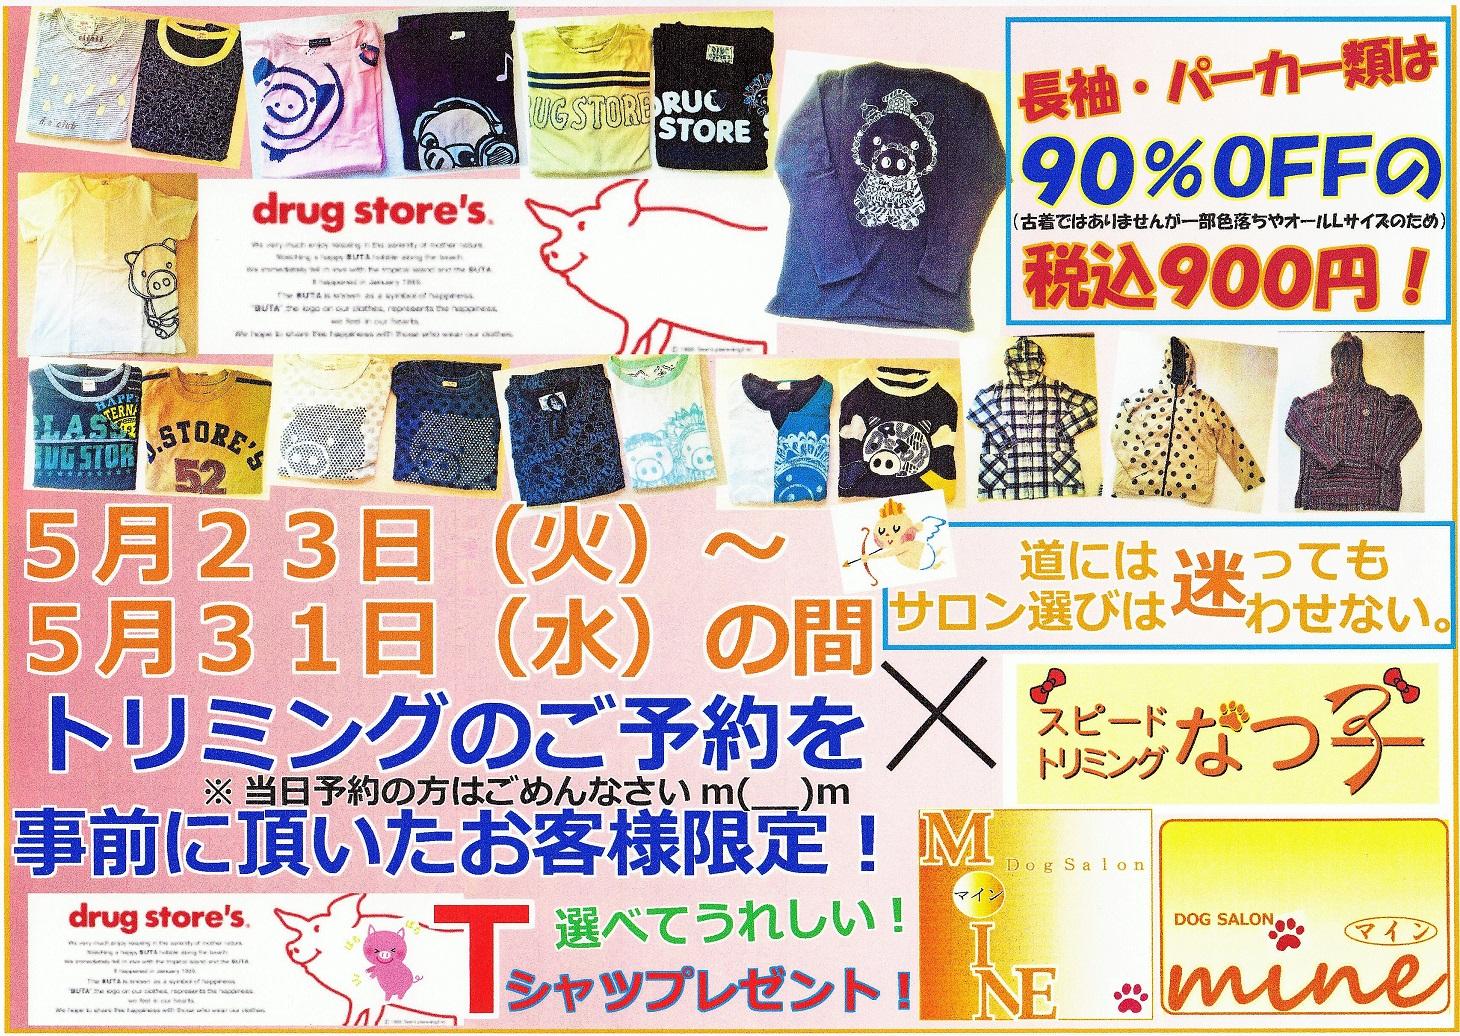 drugstorekorabo